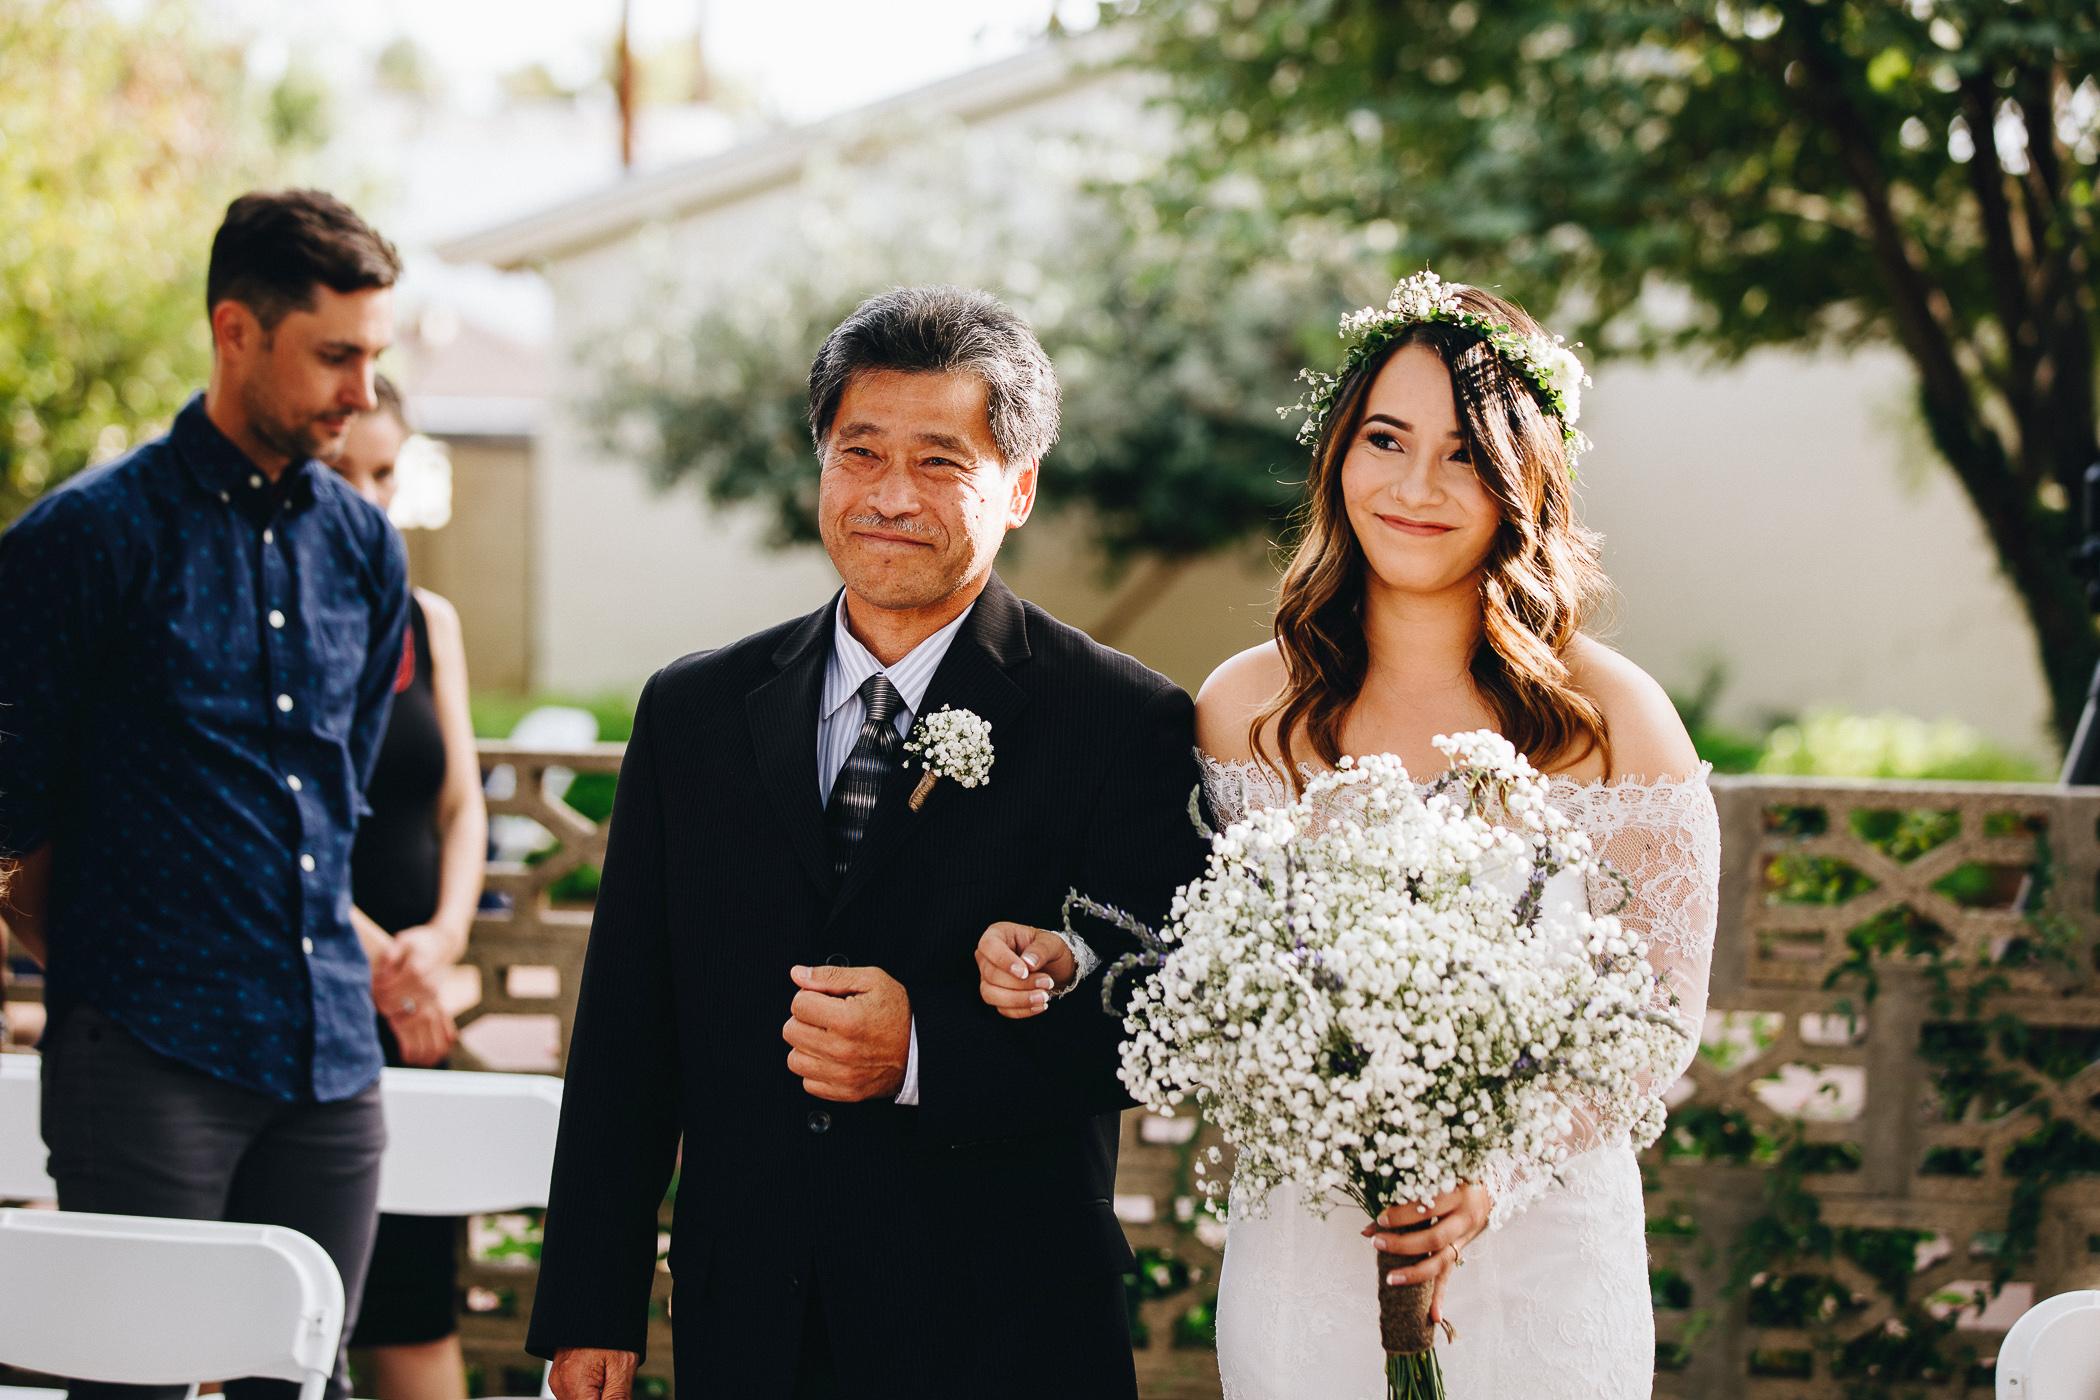 181104-Luxium-Weddings-Arizona-@matt__Le-Brandon-Kariana-Phoenix-Valley-Garden-Center-1060.jpg